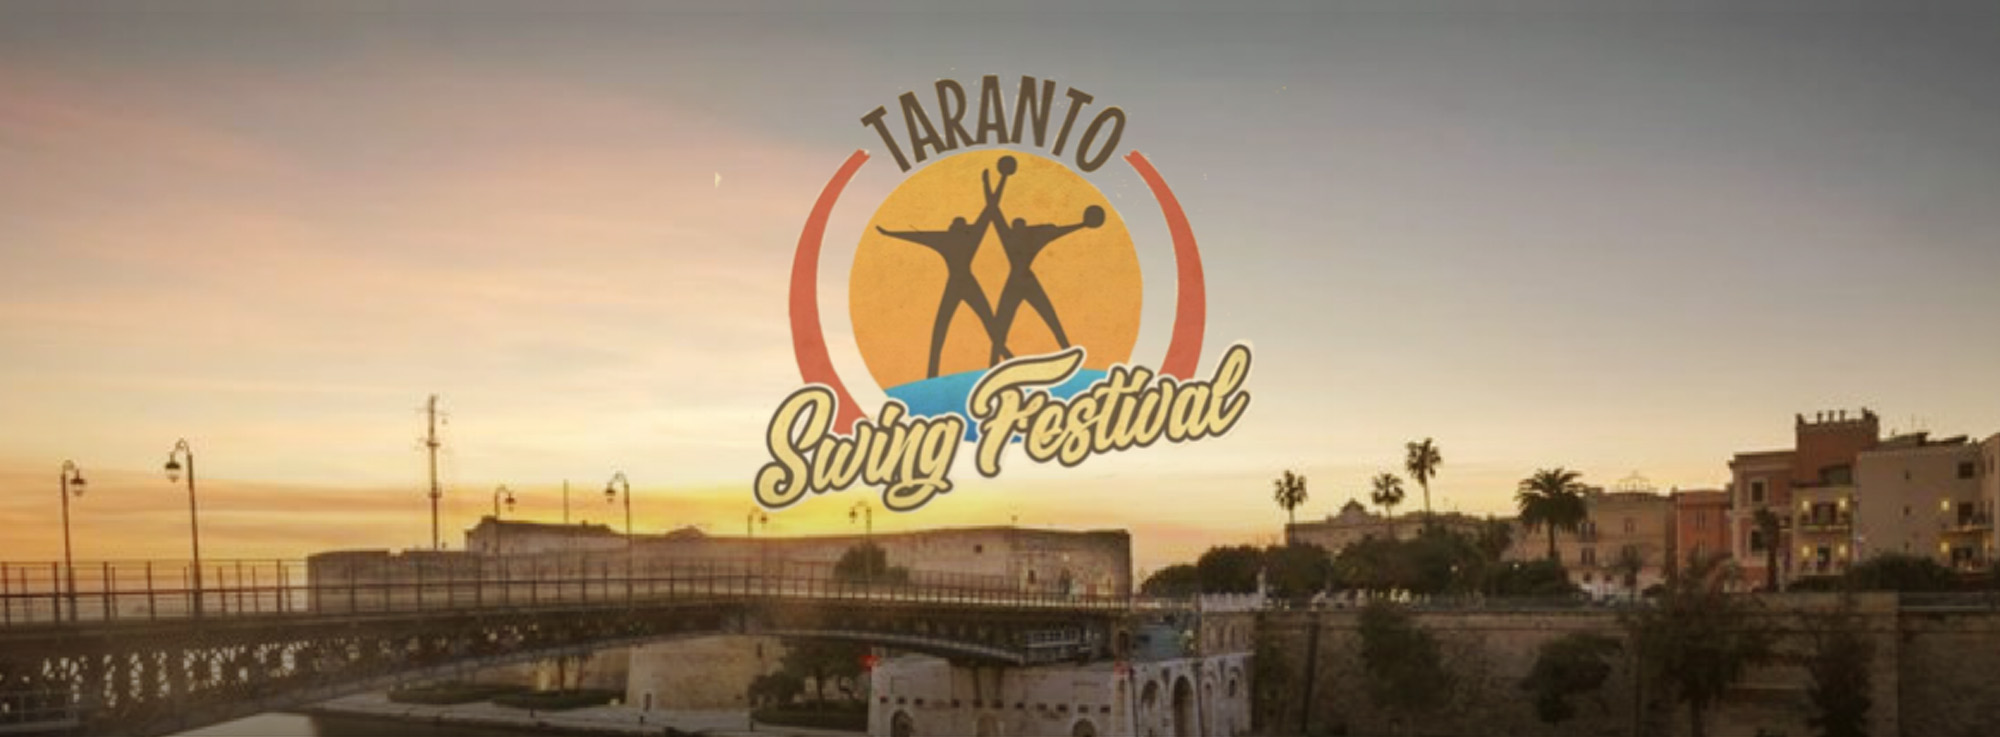 Taranto: Taranto Swing Festival